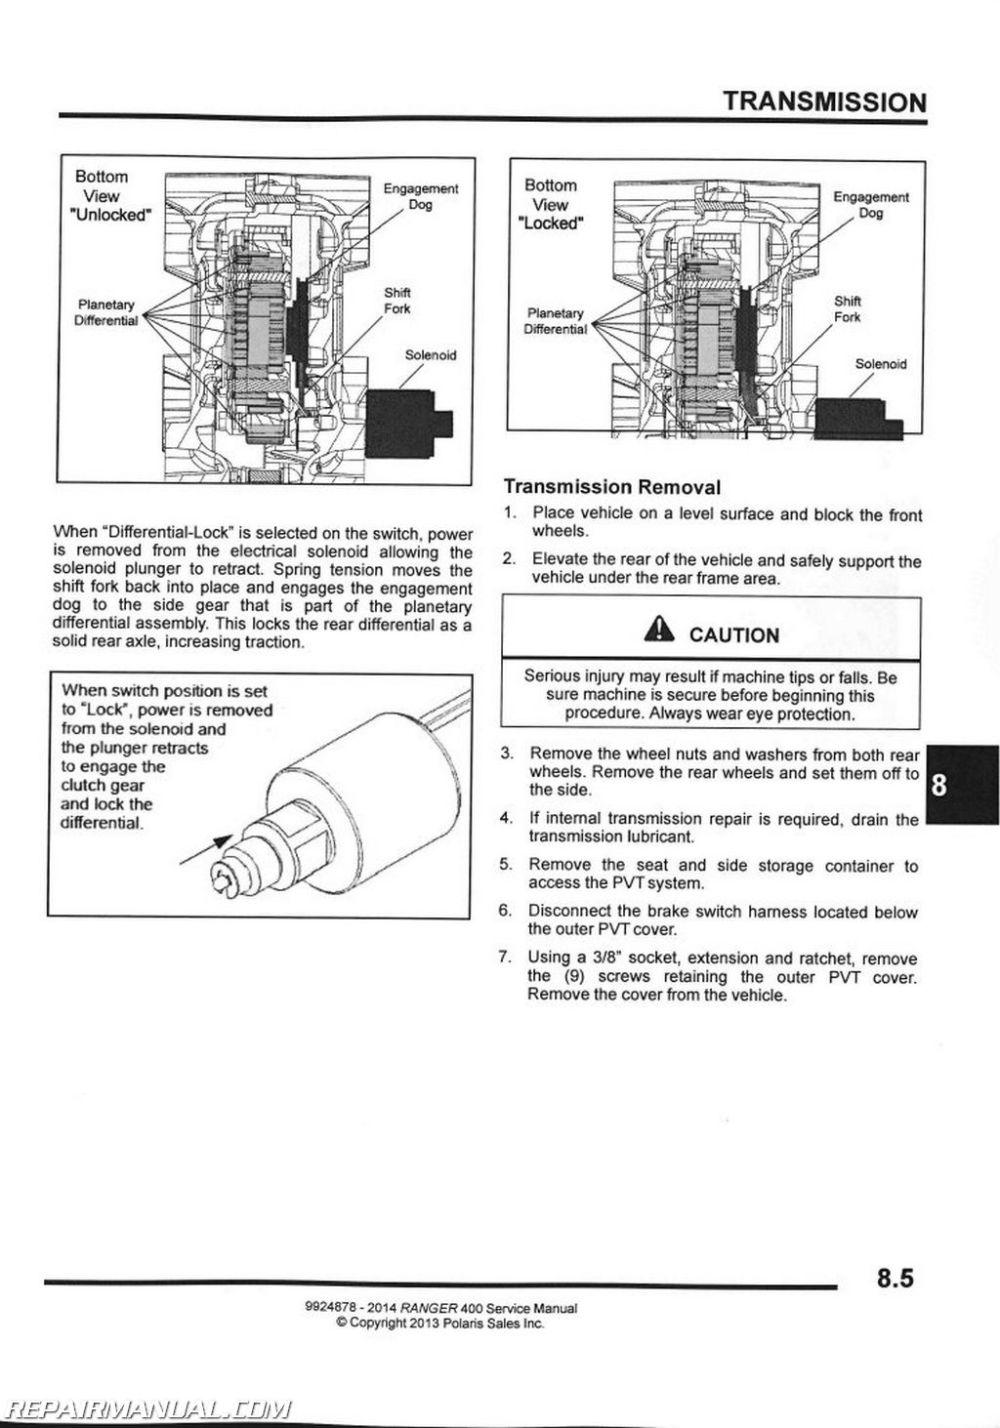 medium resolution of 2014 polaris ranger 400 side by side service manual rh repairmanual com 2013 polaris ranger wiring diagram polaris electrical schematics